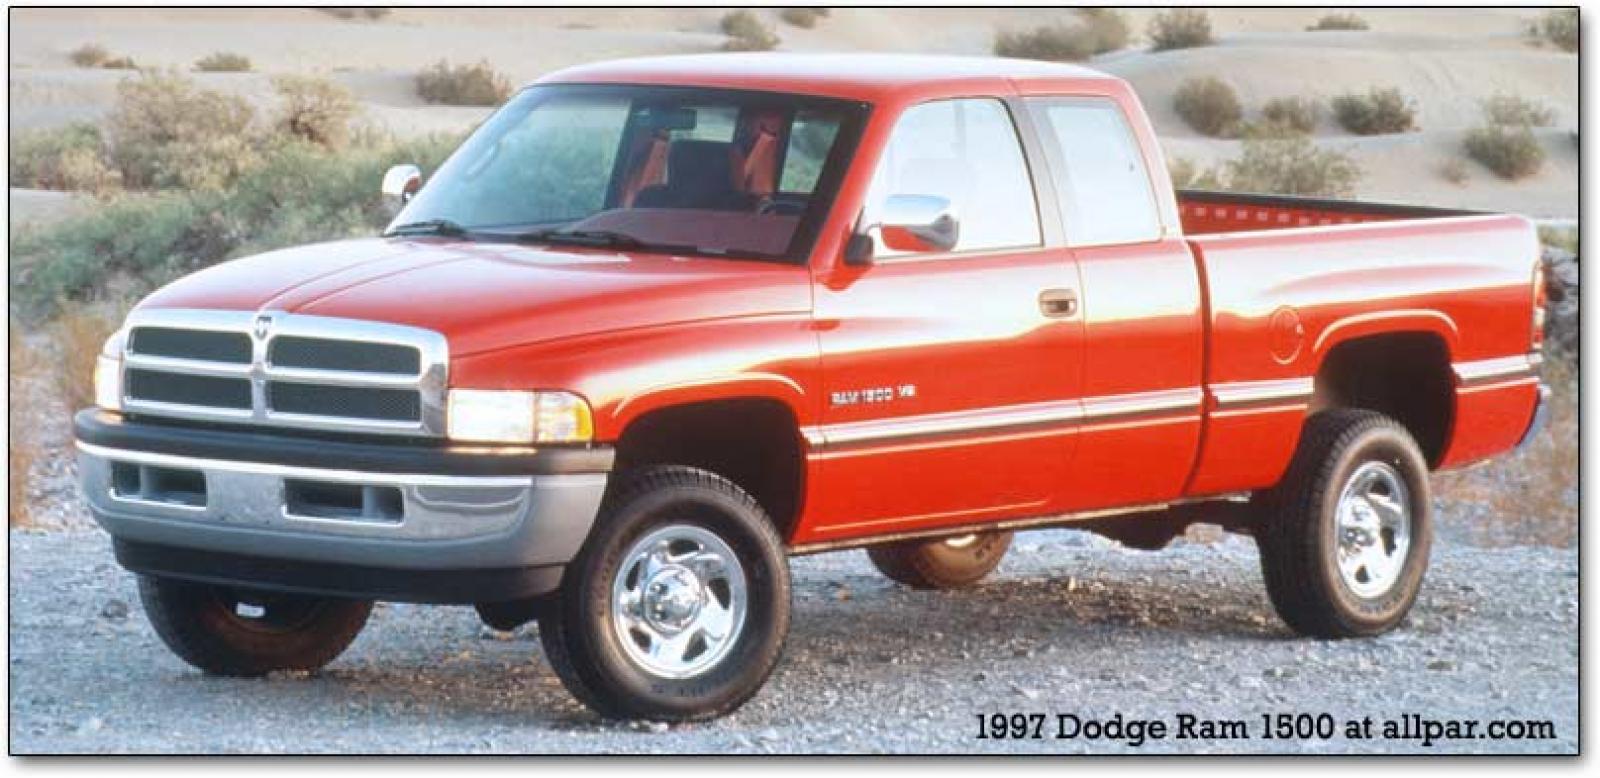 Dodge Ram Pickup on 1989 Dodge Dually